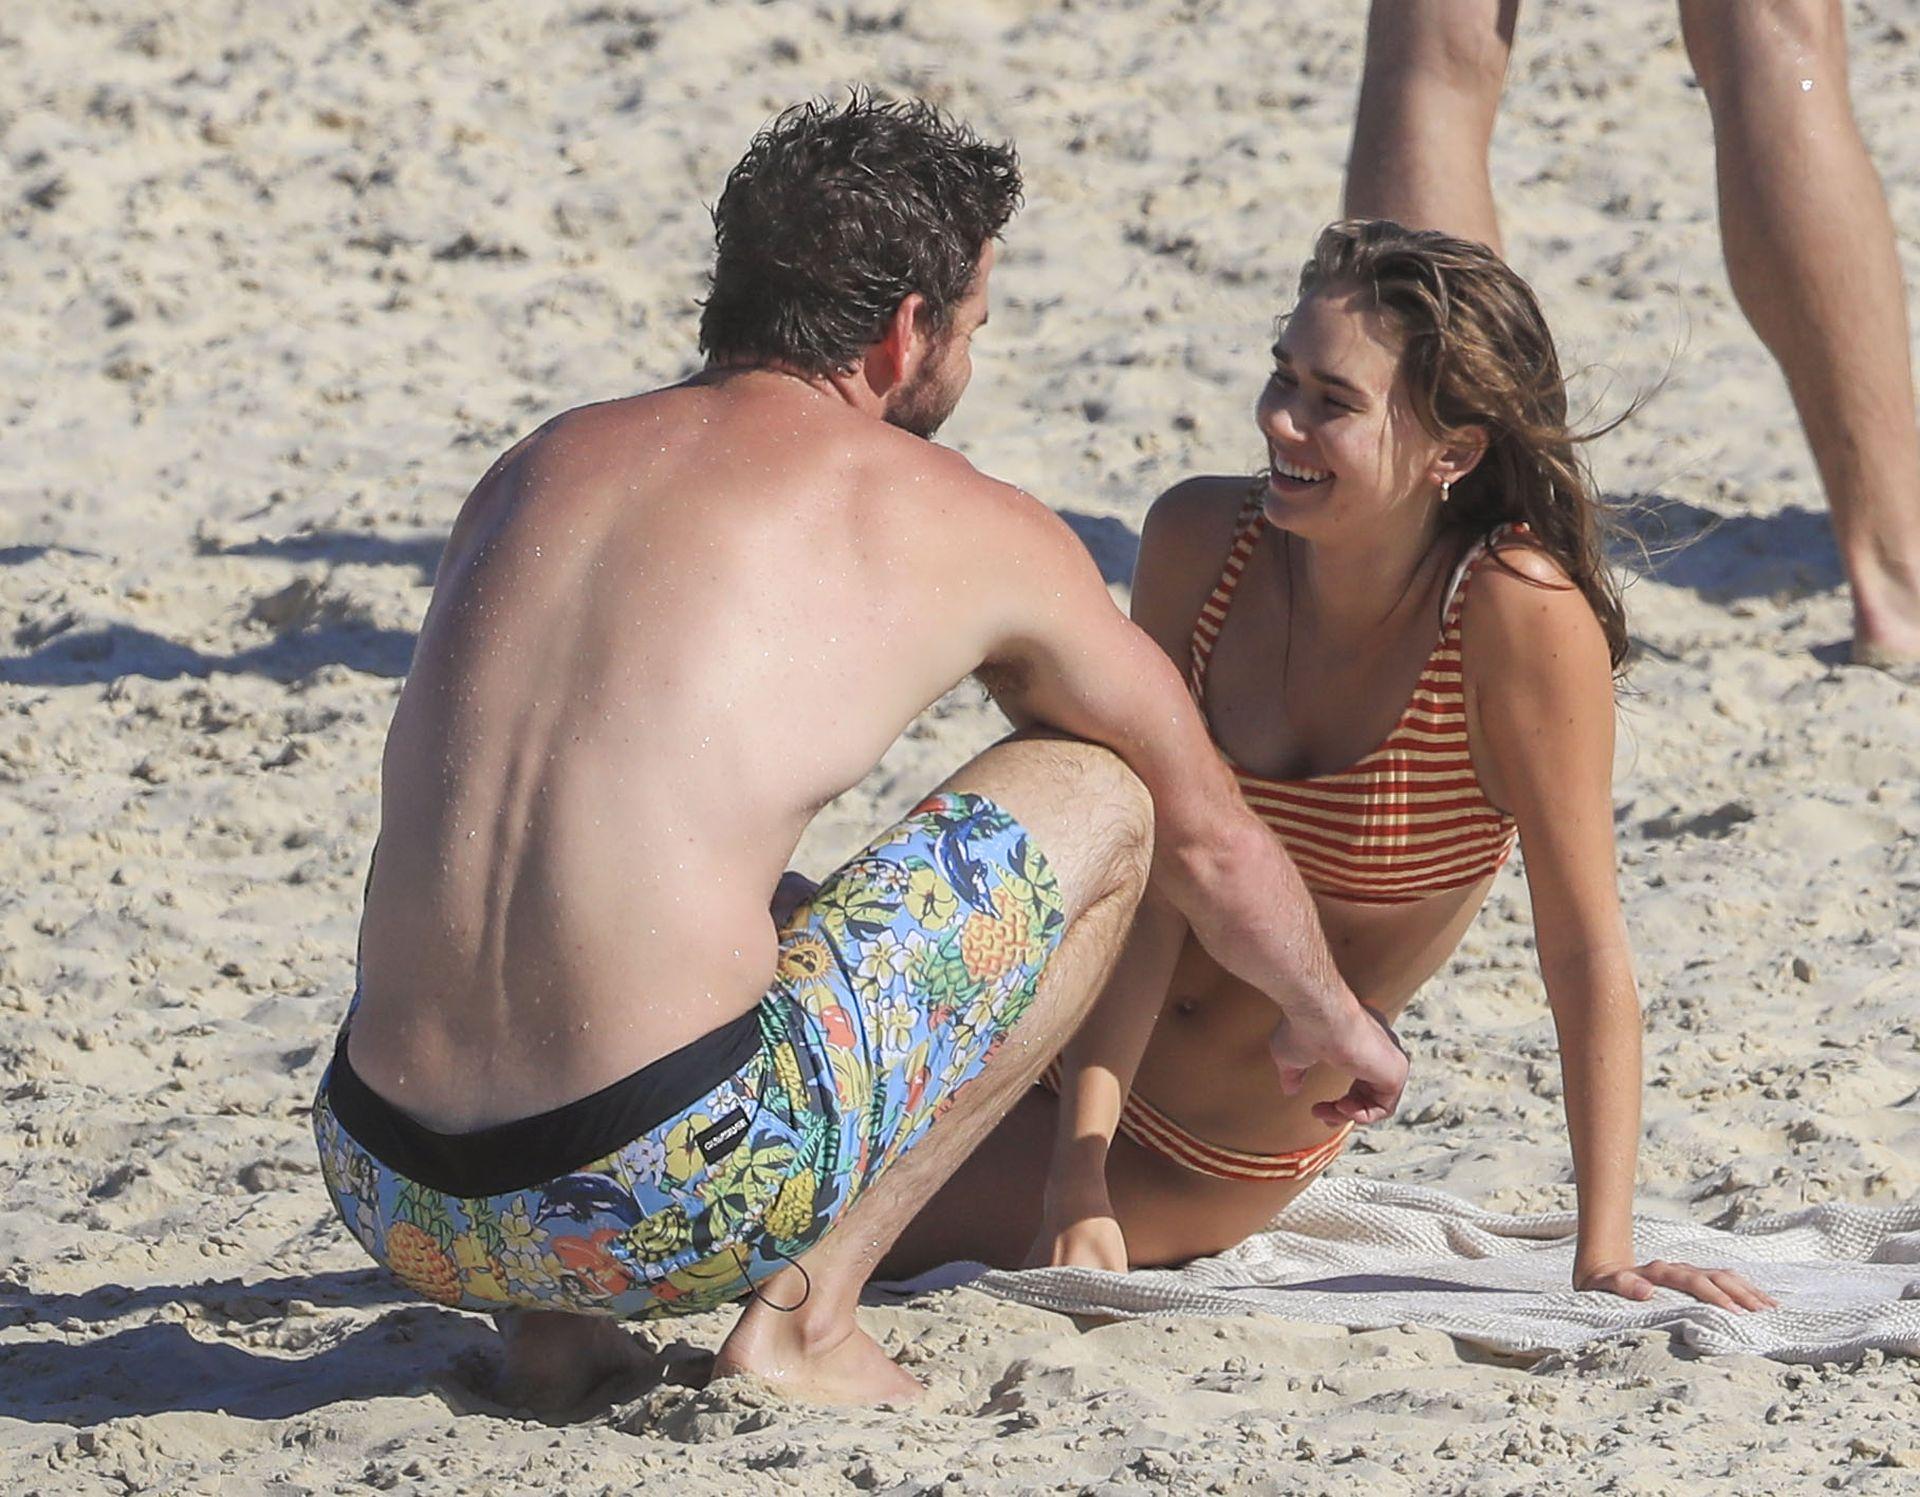 Gabriella Brooks Hot – Liam Hemsworth's New Girlfriend 0014